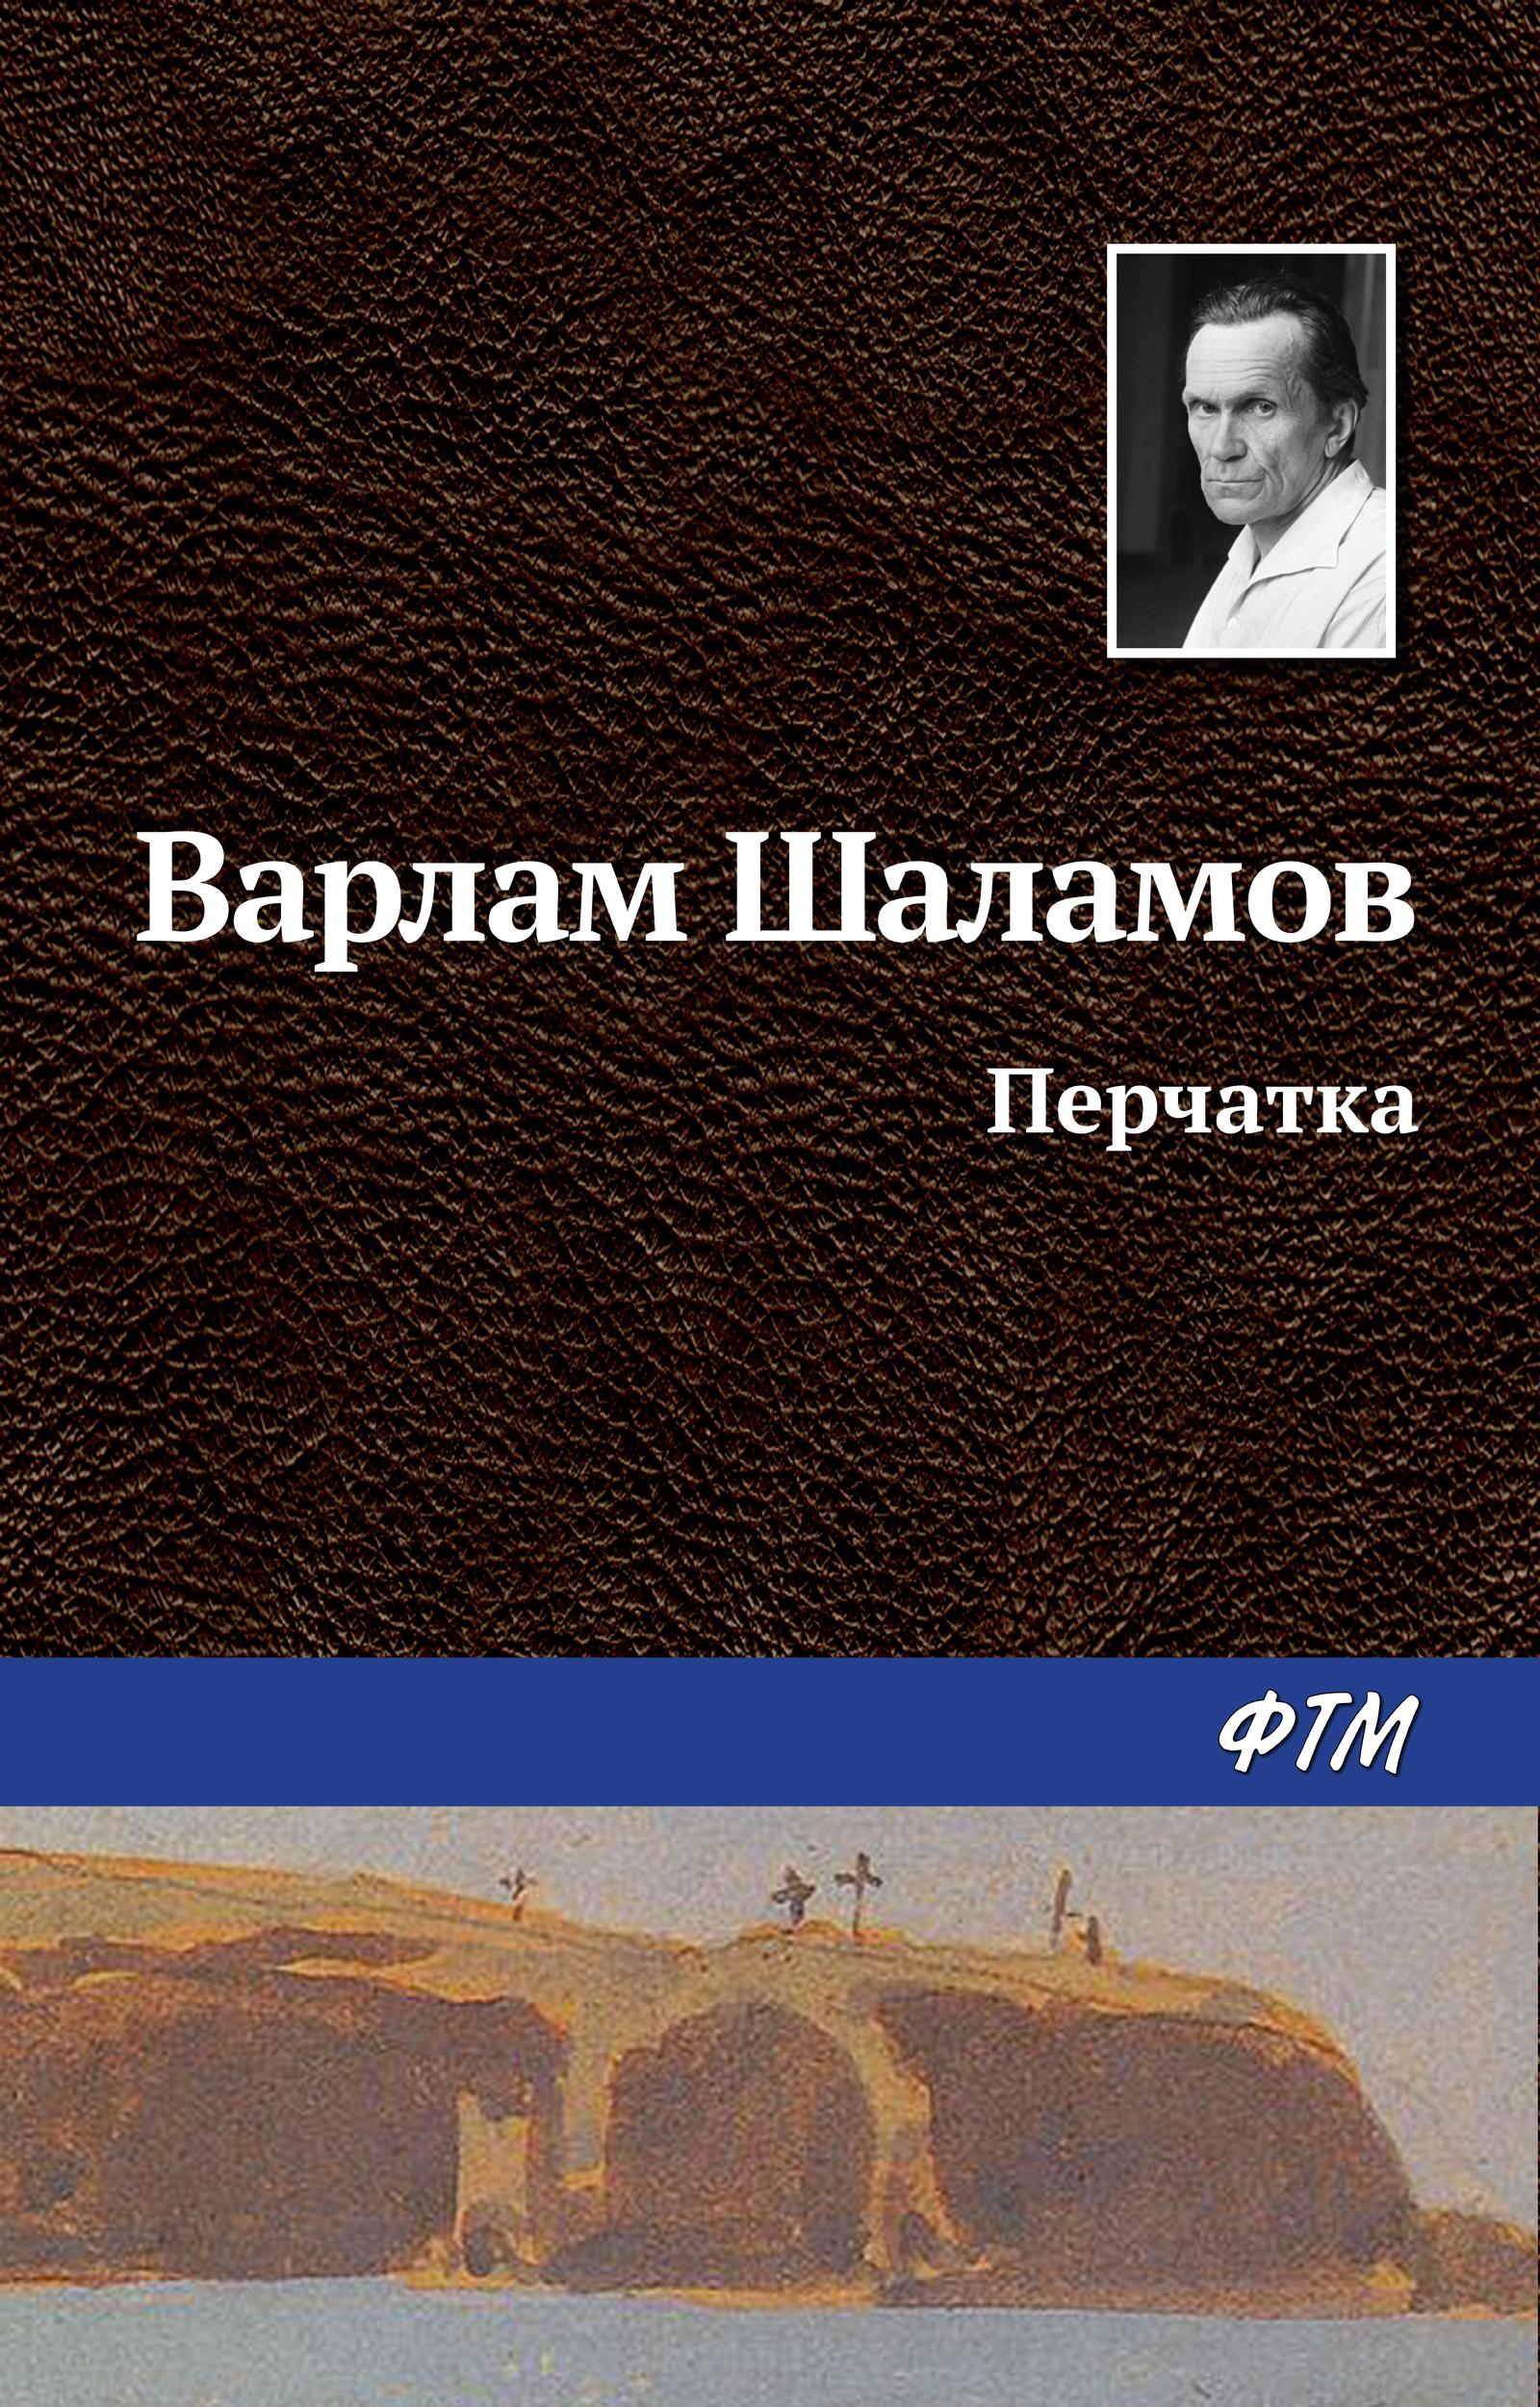 Варлам Шаламов Перчатка